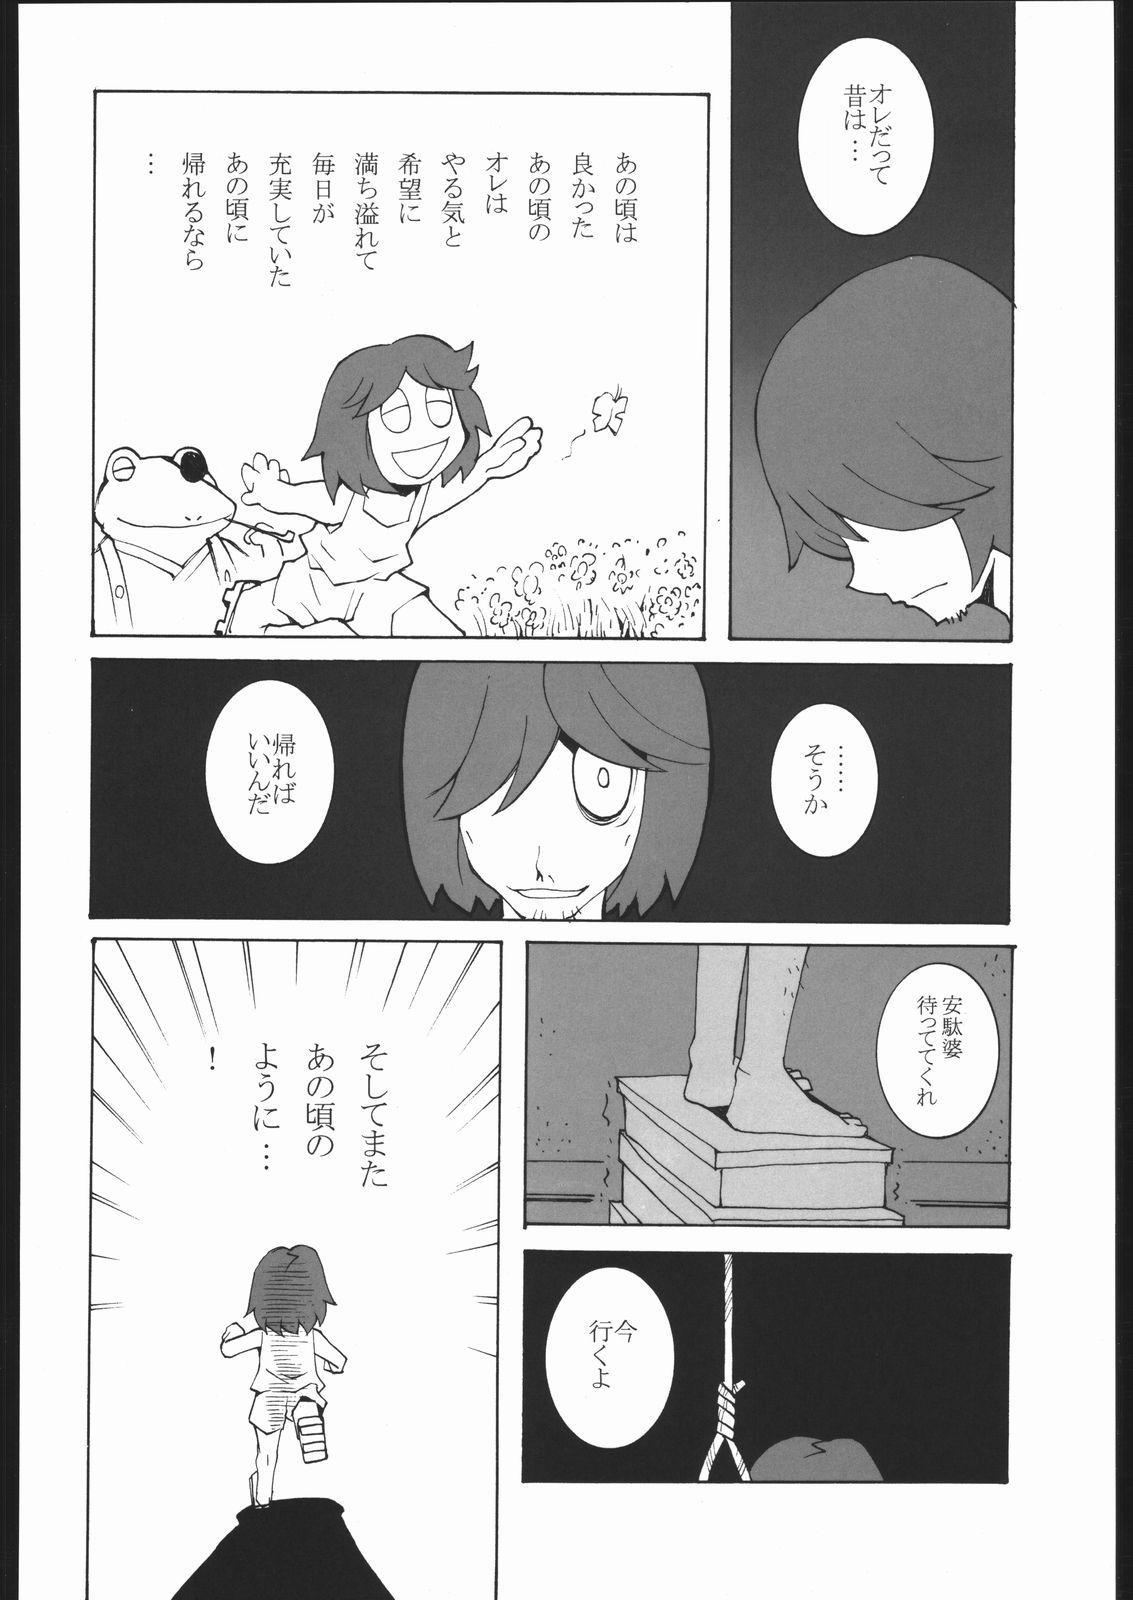 Adachi Misemono Club 189